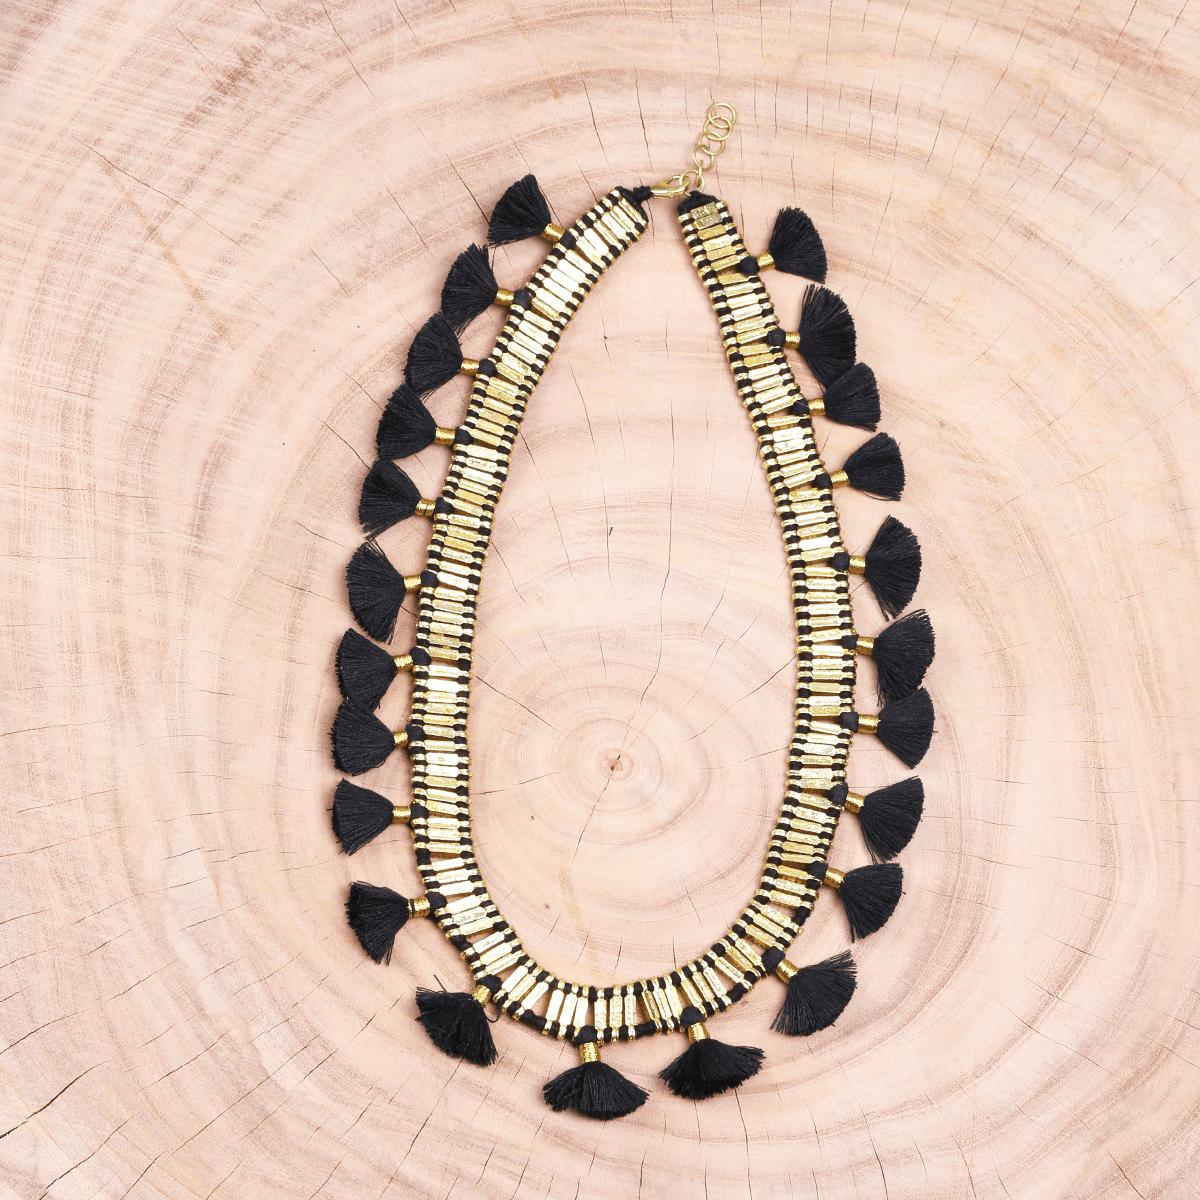 Bohemian Round Neck Tassel Metal Necklace - Black